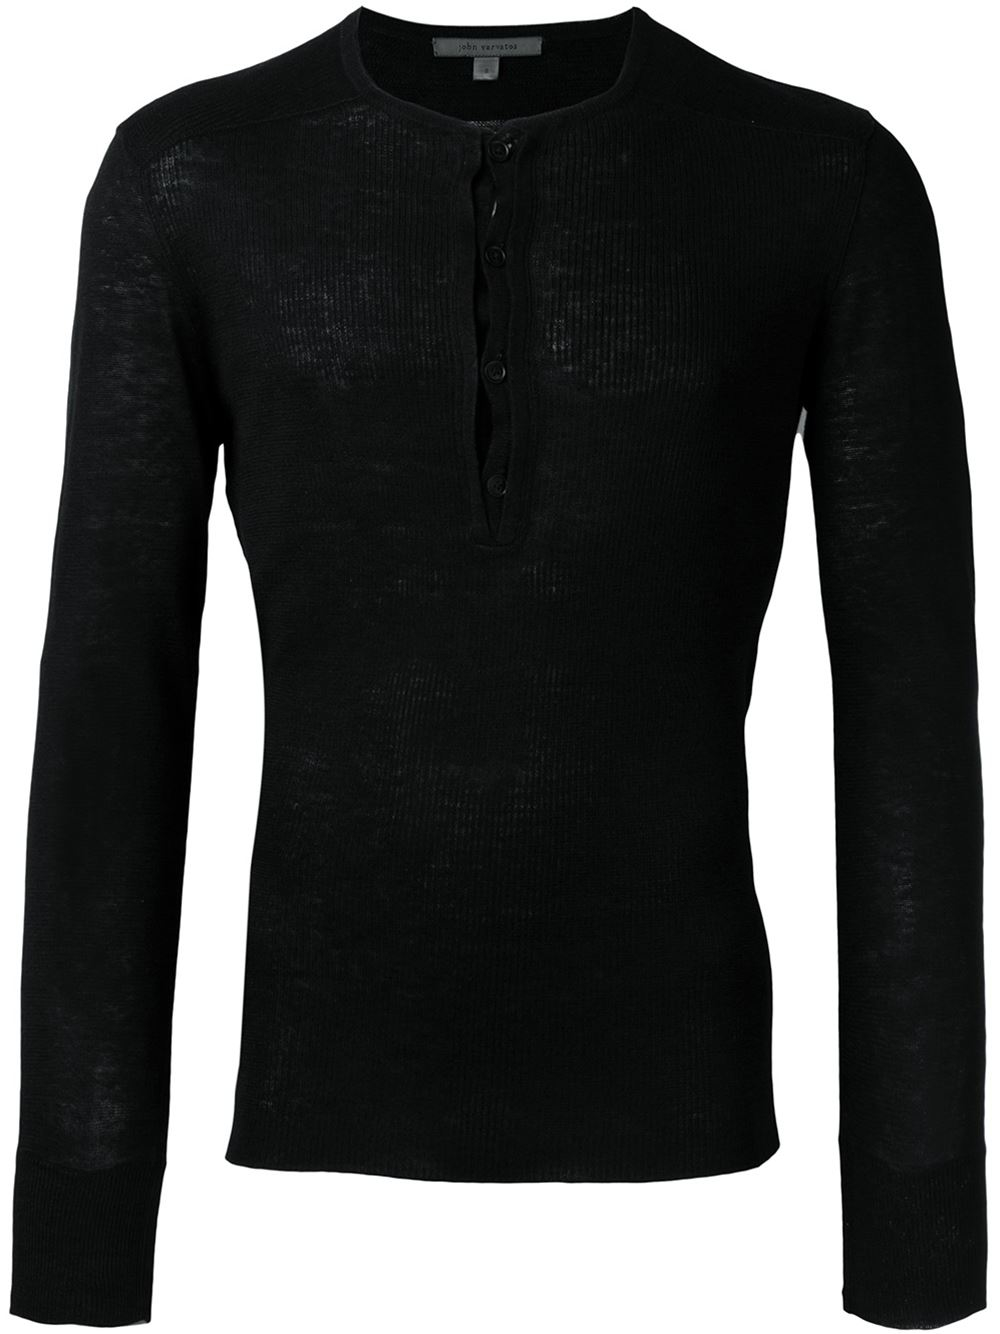 Lyst john varvatos long sleeve henley t shirt in black for Black long sleeve henley shirt